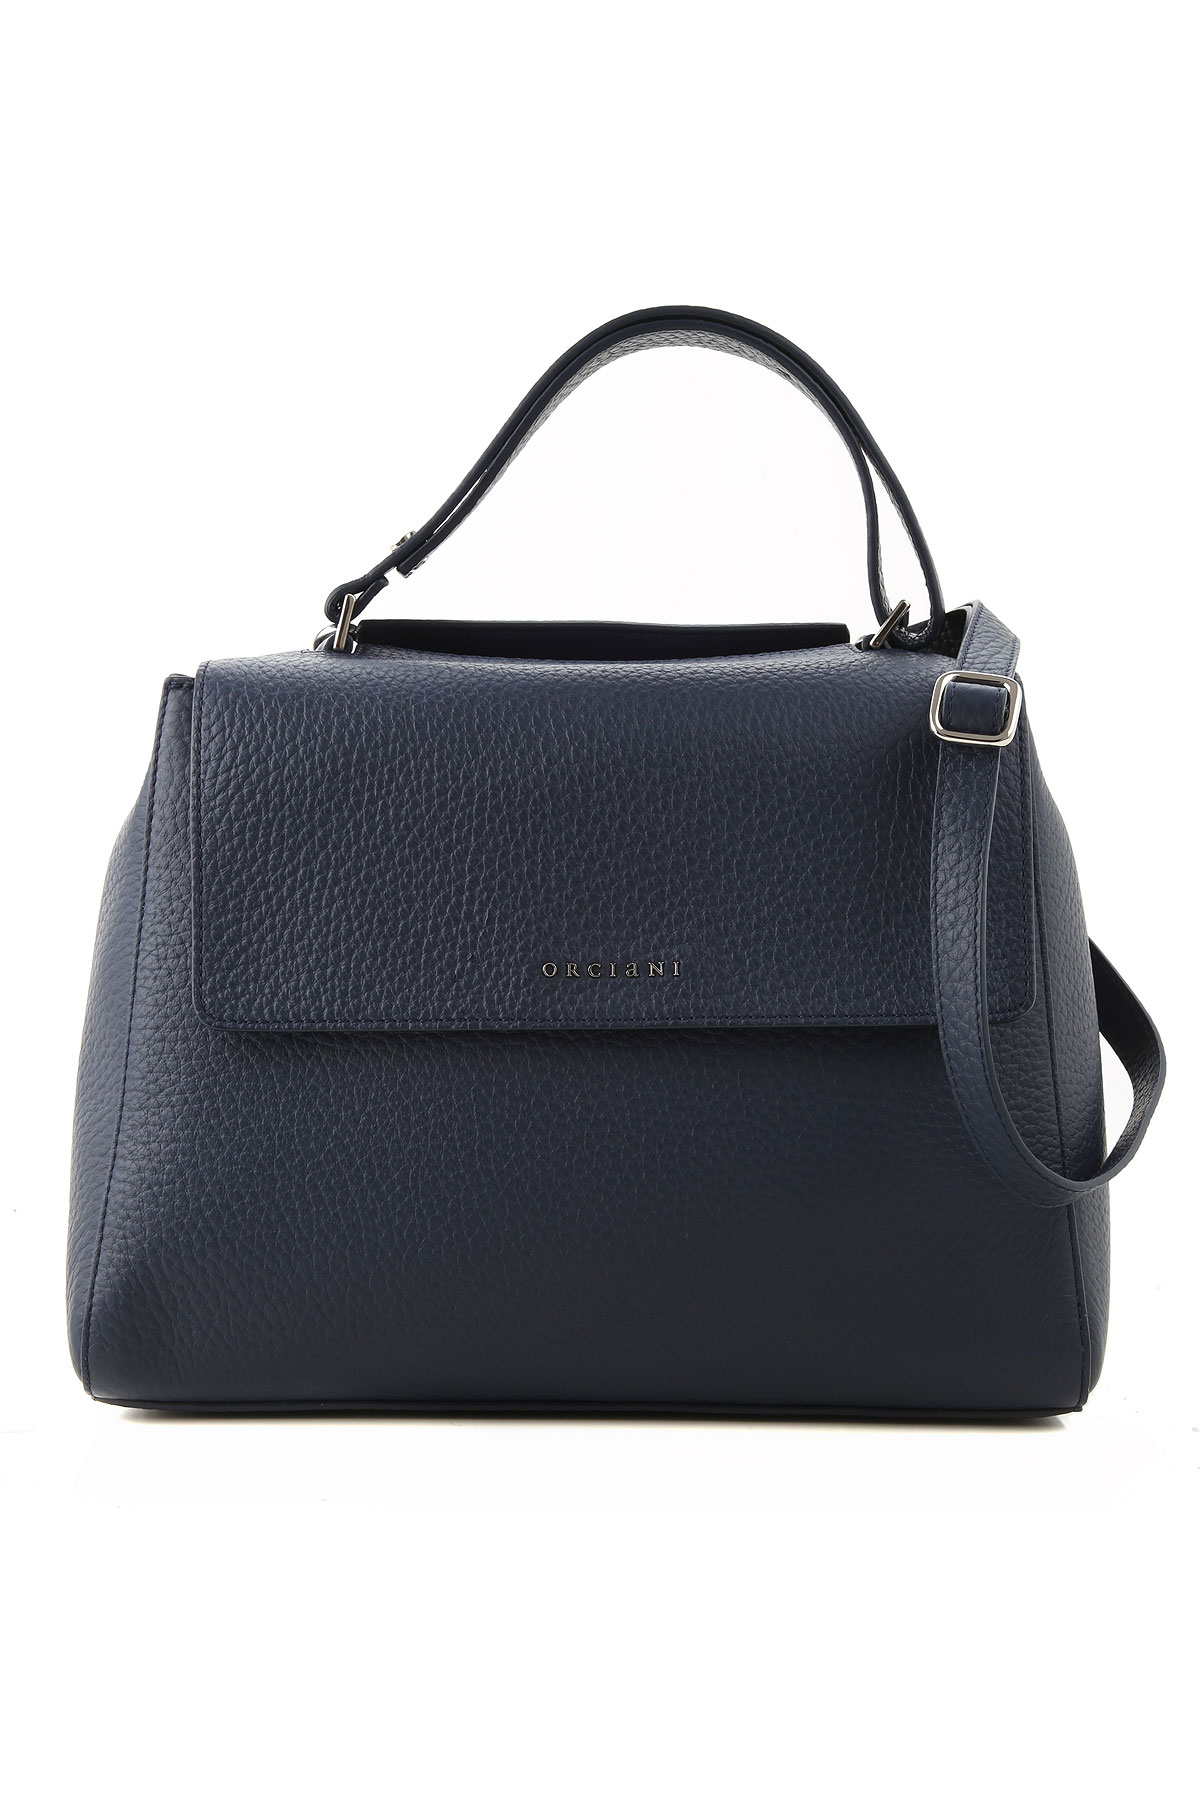 Orciani Shoulder Bag for Women On Sale, navy, Leather, 2019